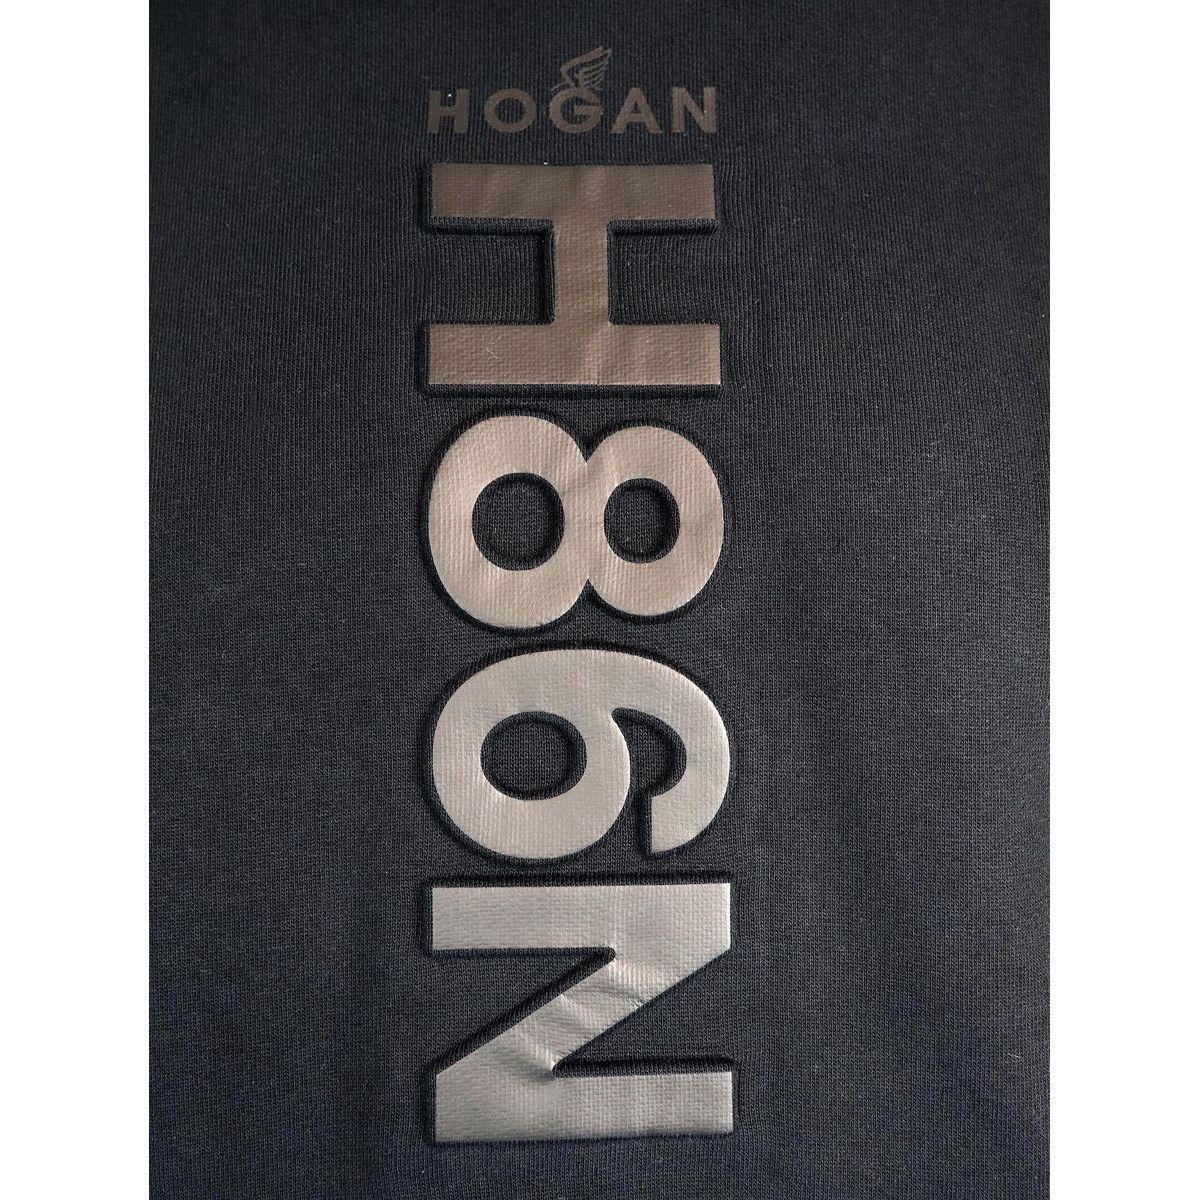 Cotton sweatshirt with hood and front pocket Black Hogan